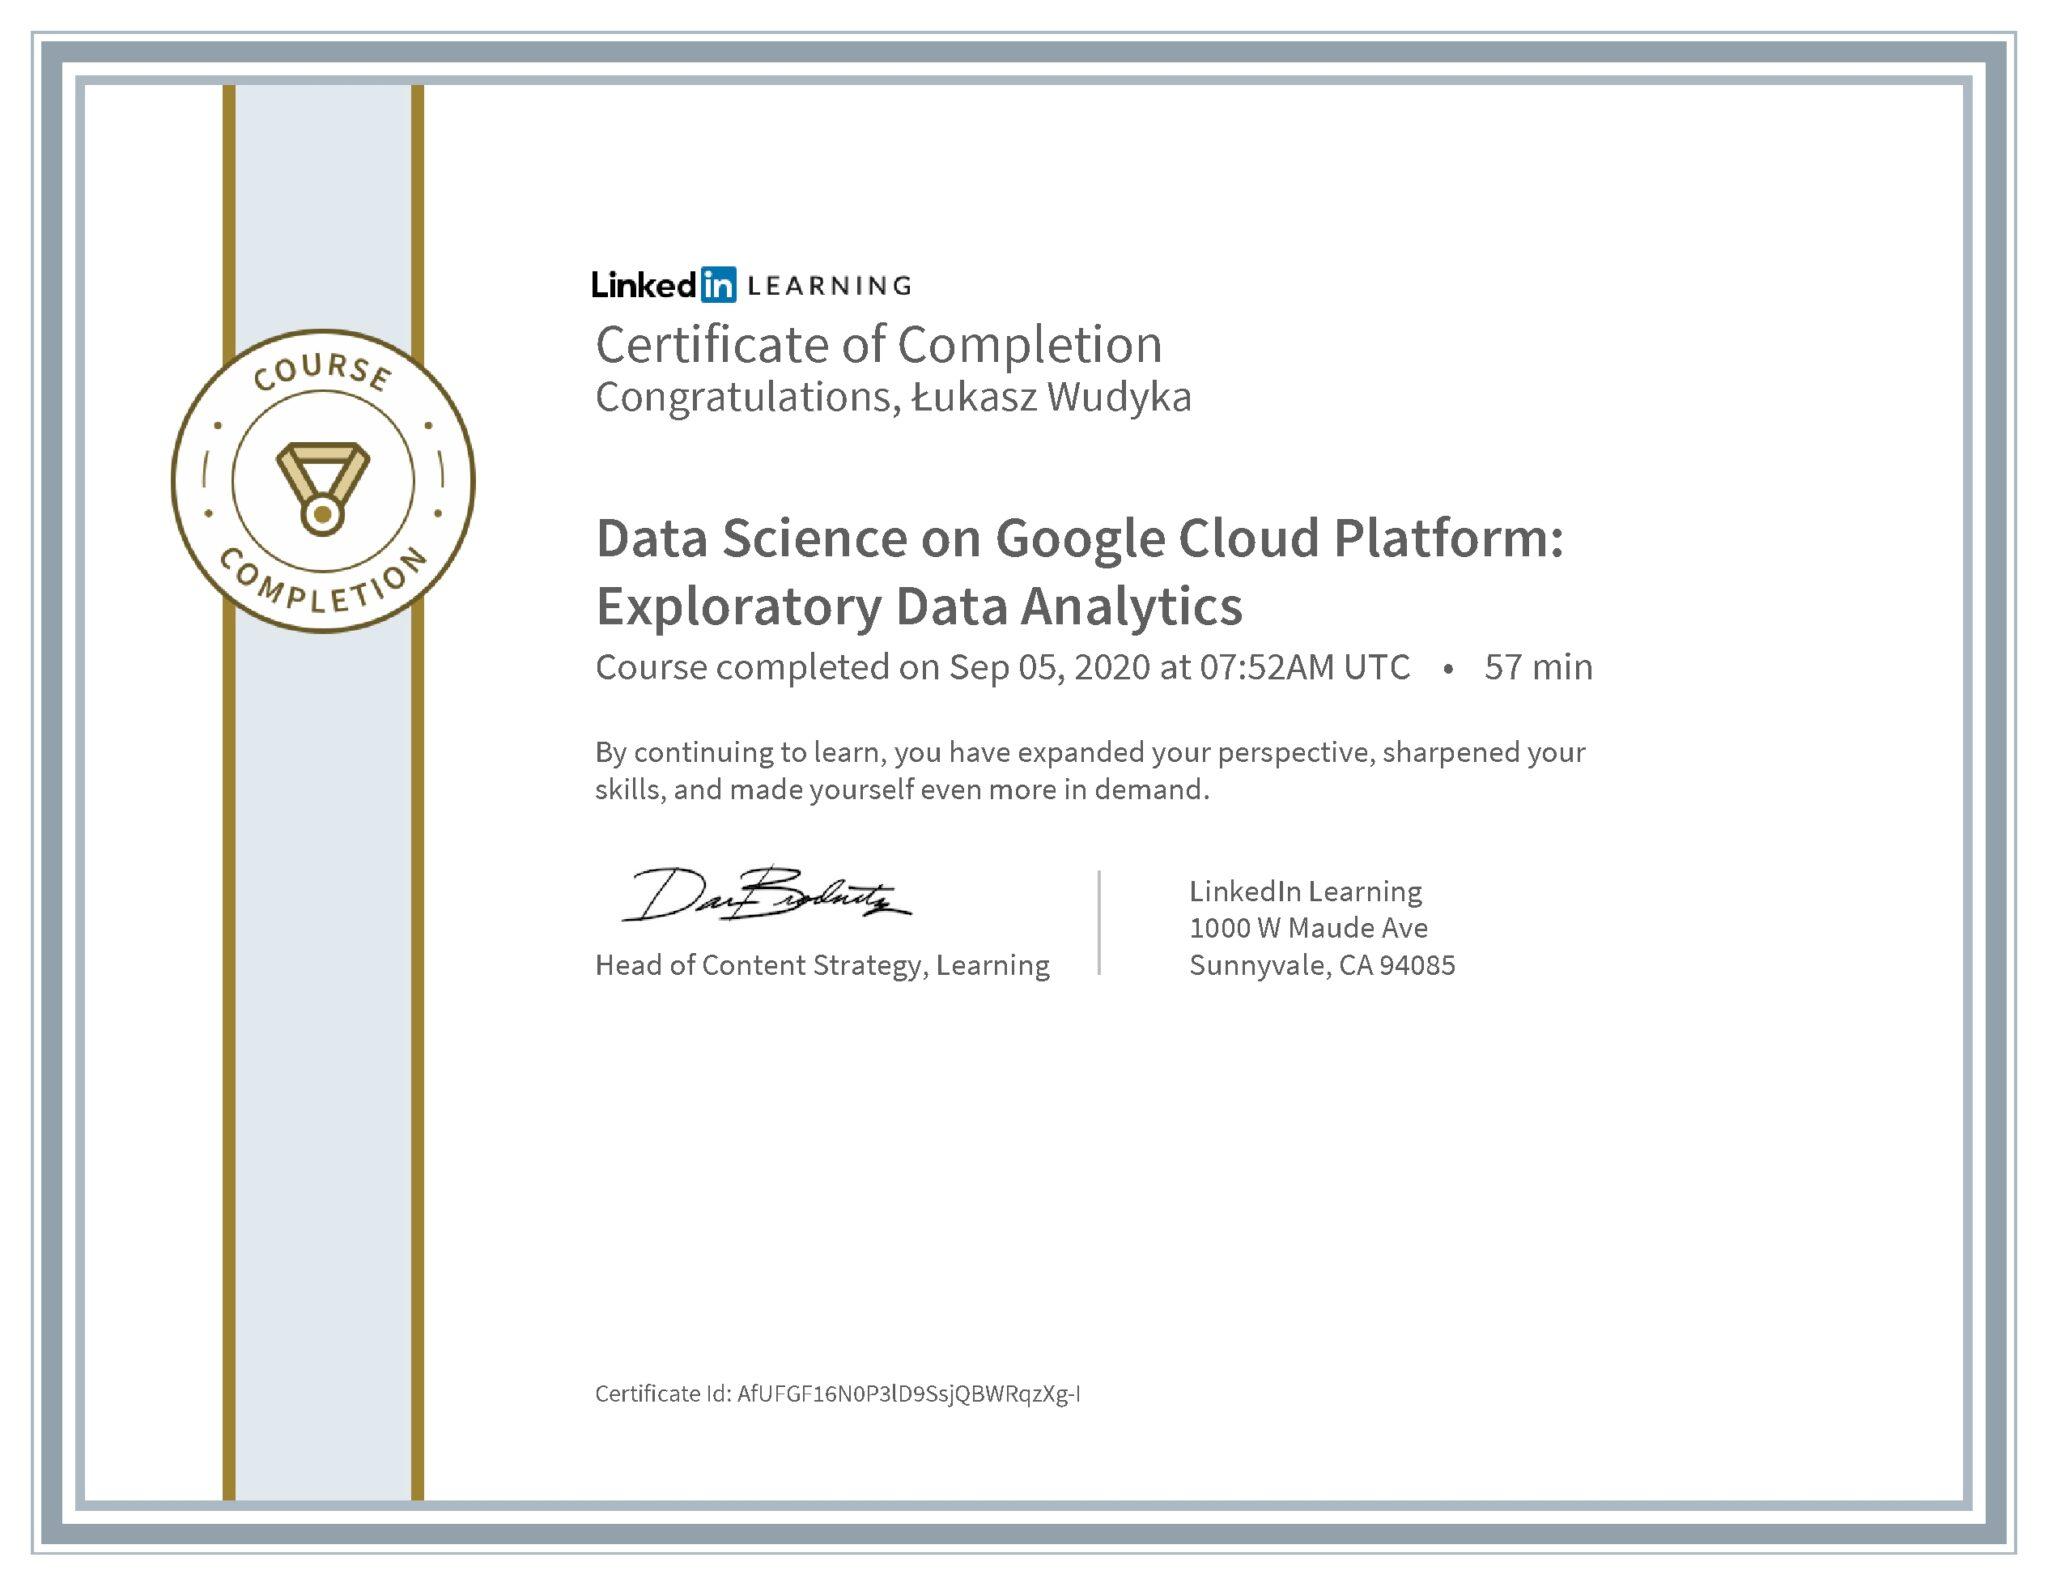 Łukasz Wudyka certyfikat LinkedIn Data Science on Google Cloud Platform: Exploratory Data Analytics